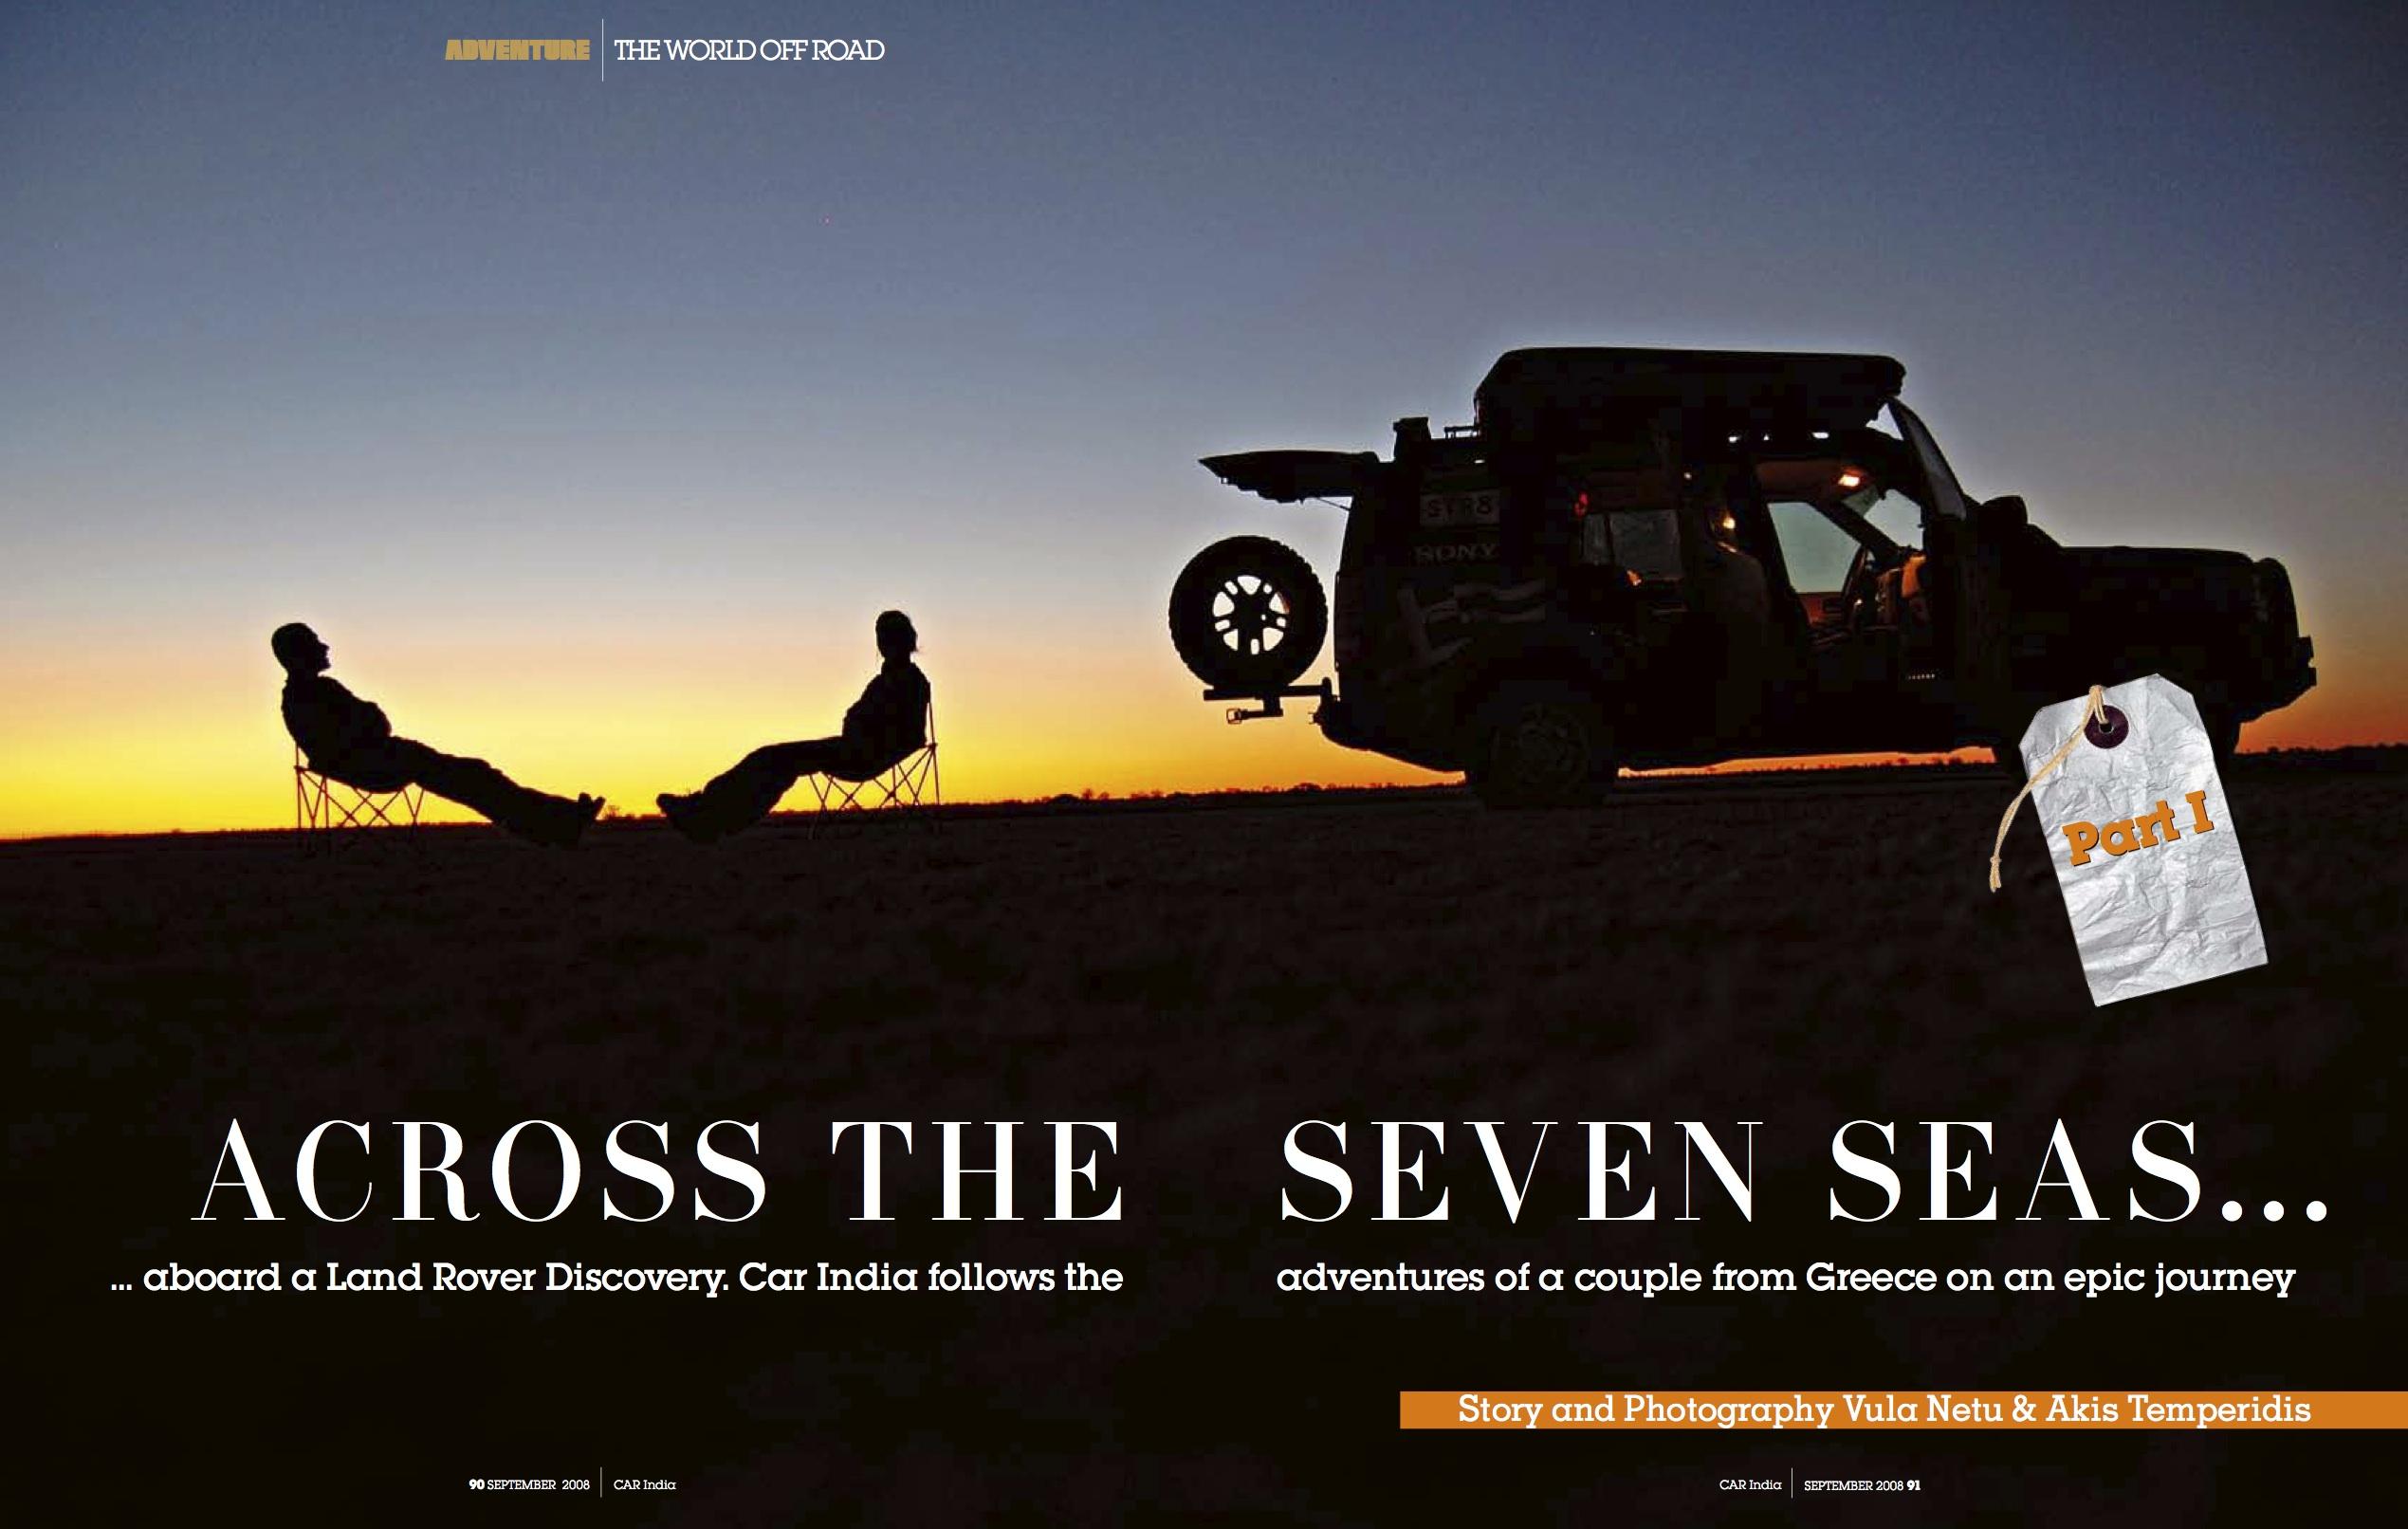 Car of India magazine, September 2008